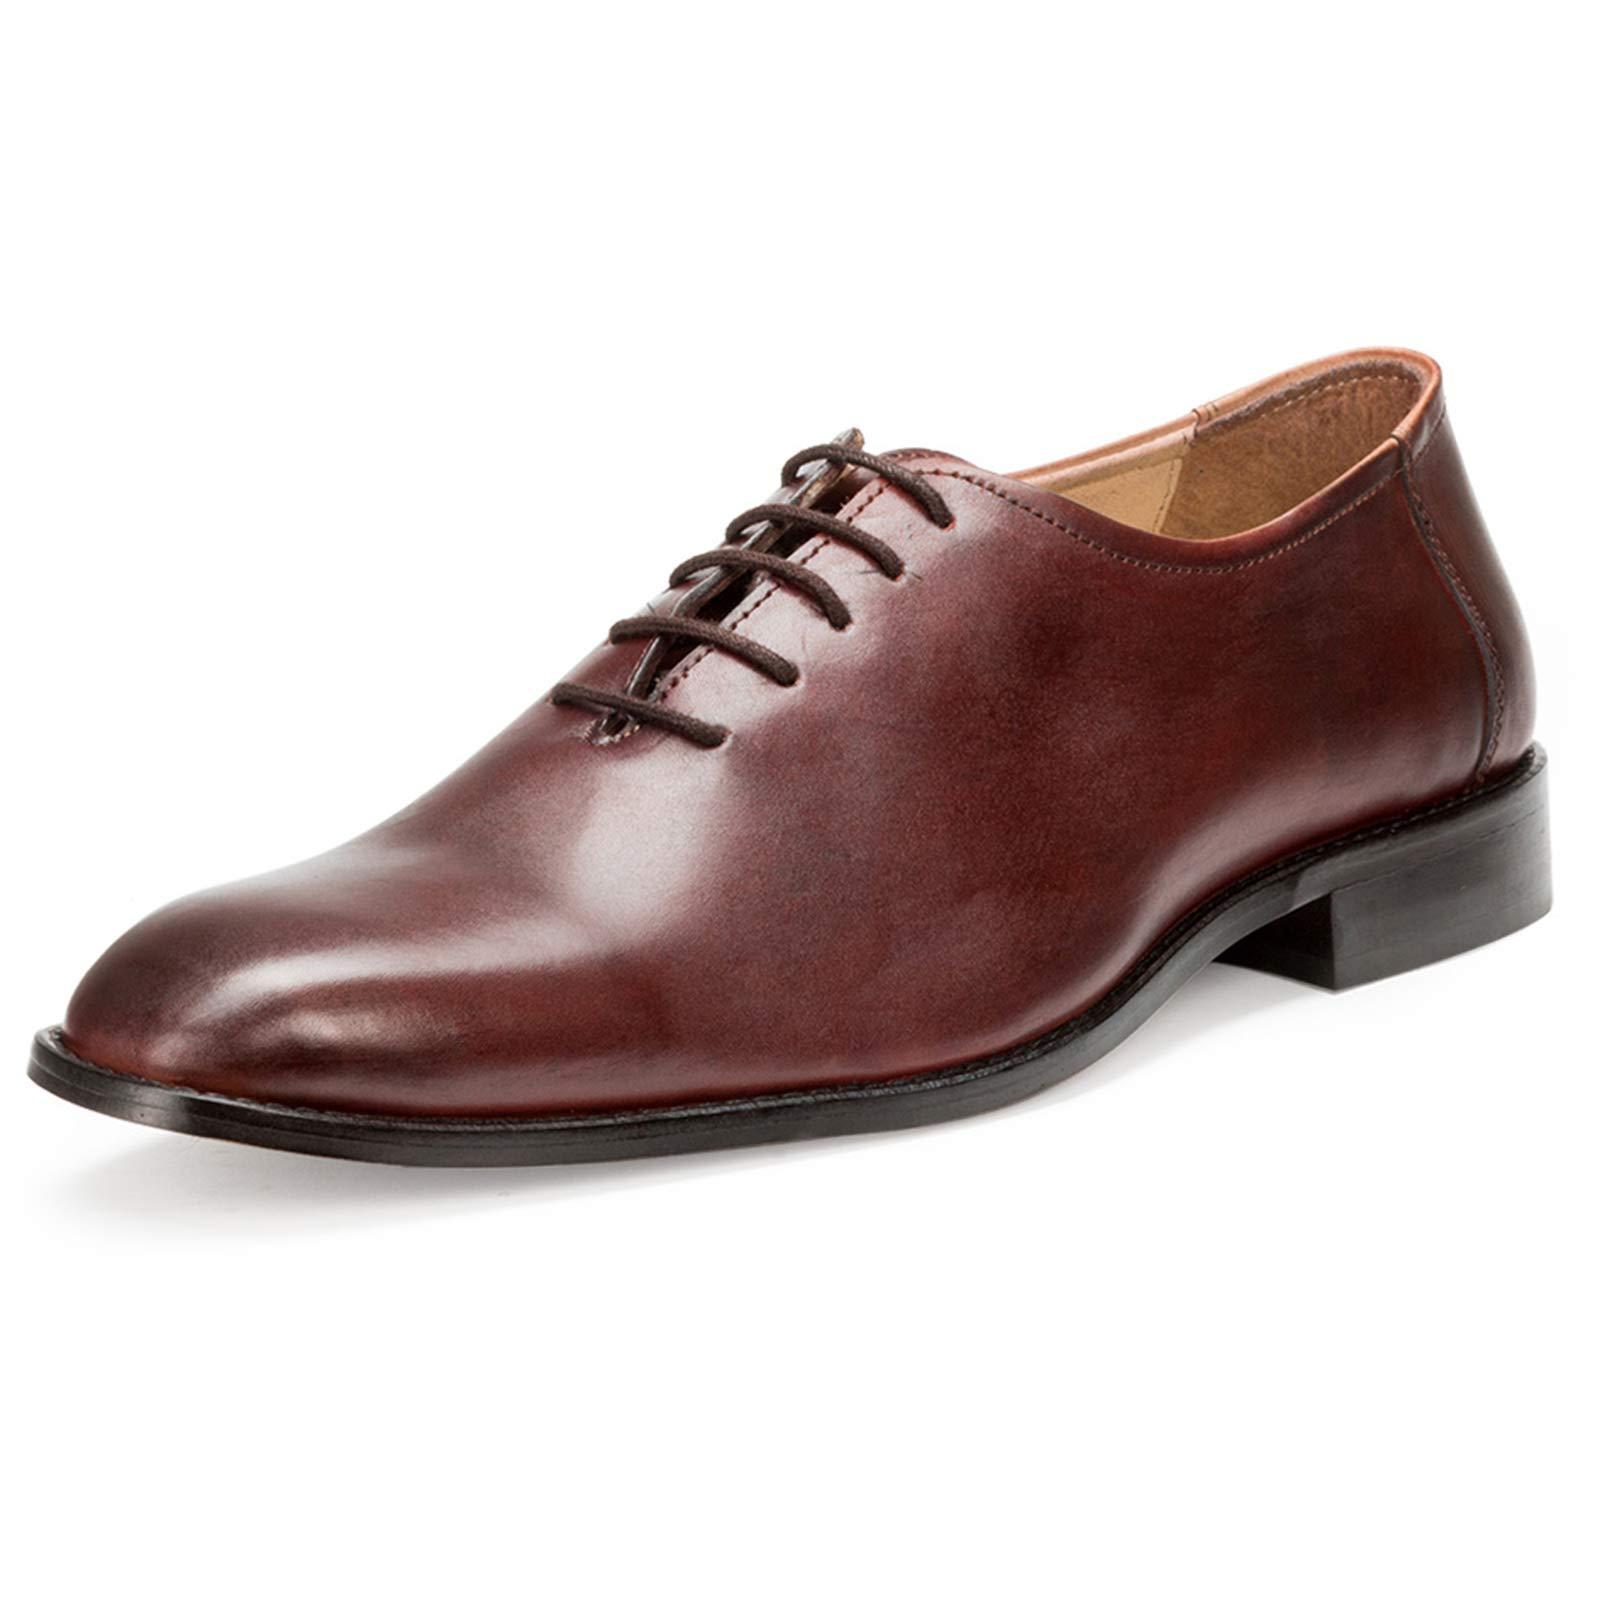 Escaro Royale Men's Premium Handcrafted Formal Oxford Dress Shoes